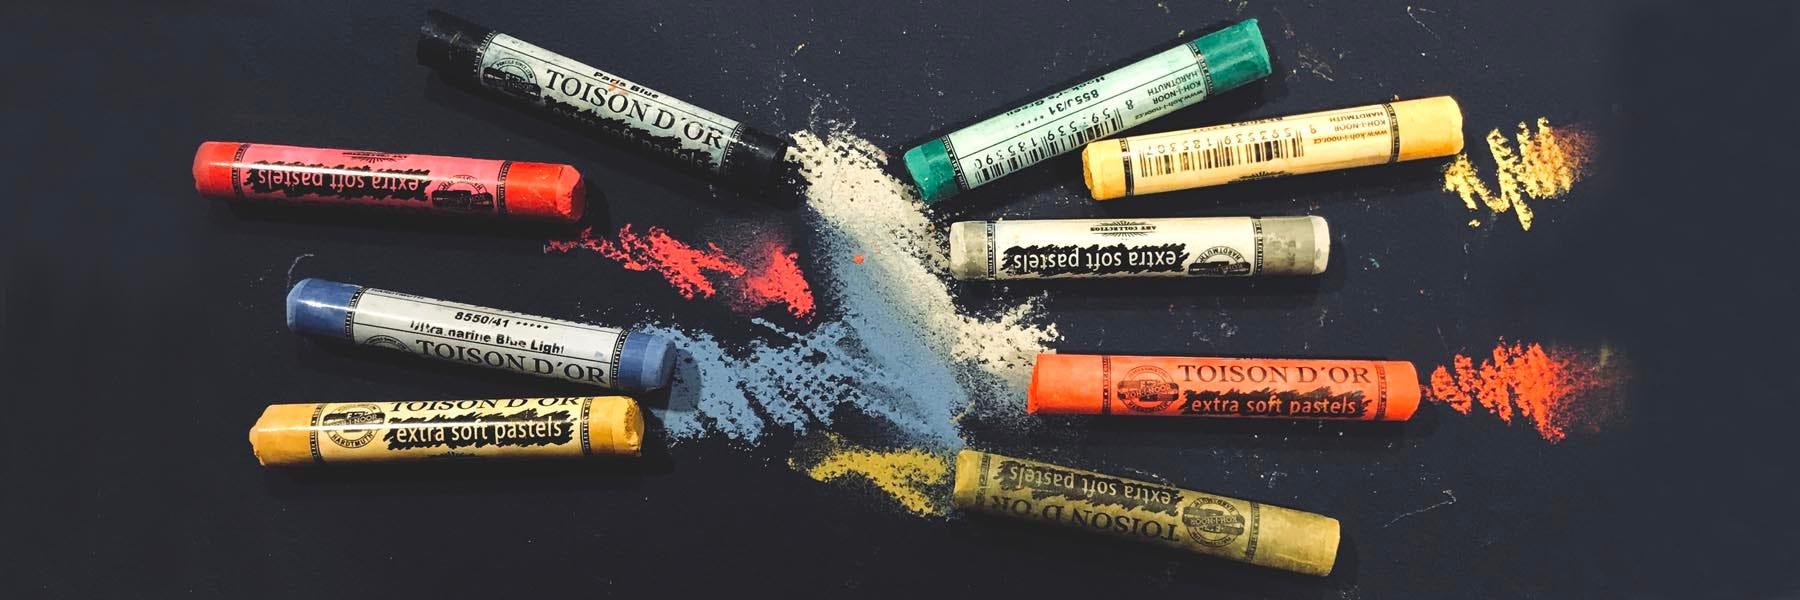 Koh-I-Noor extra soft pastels